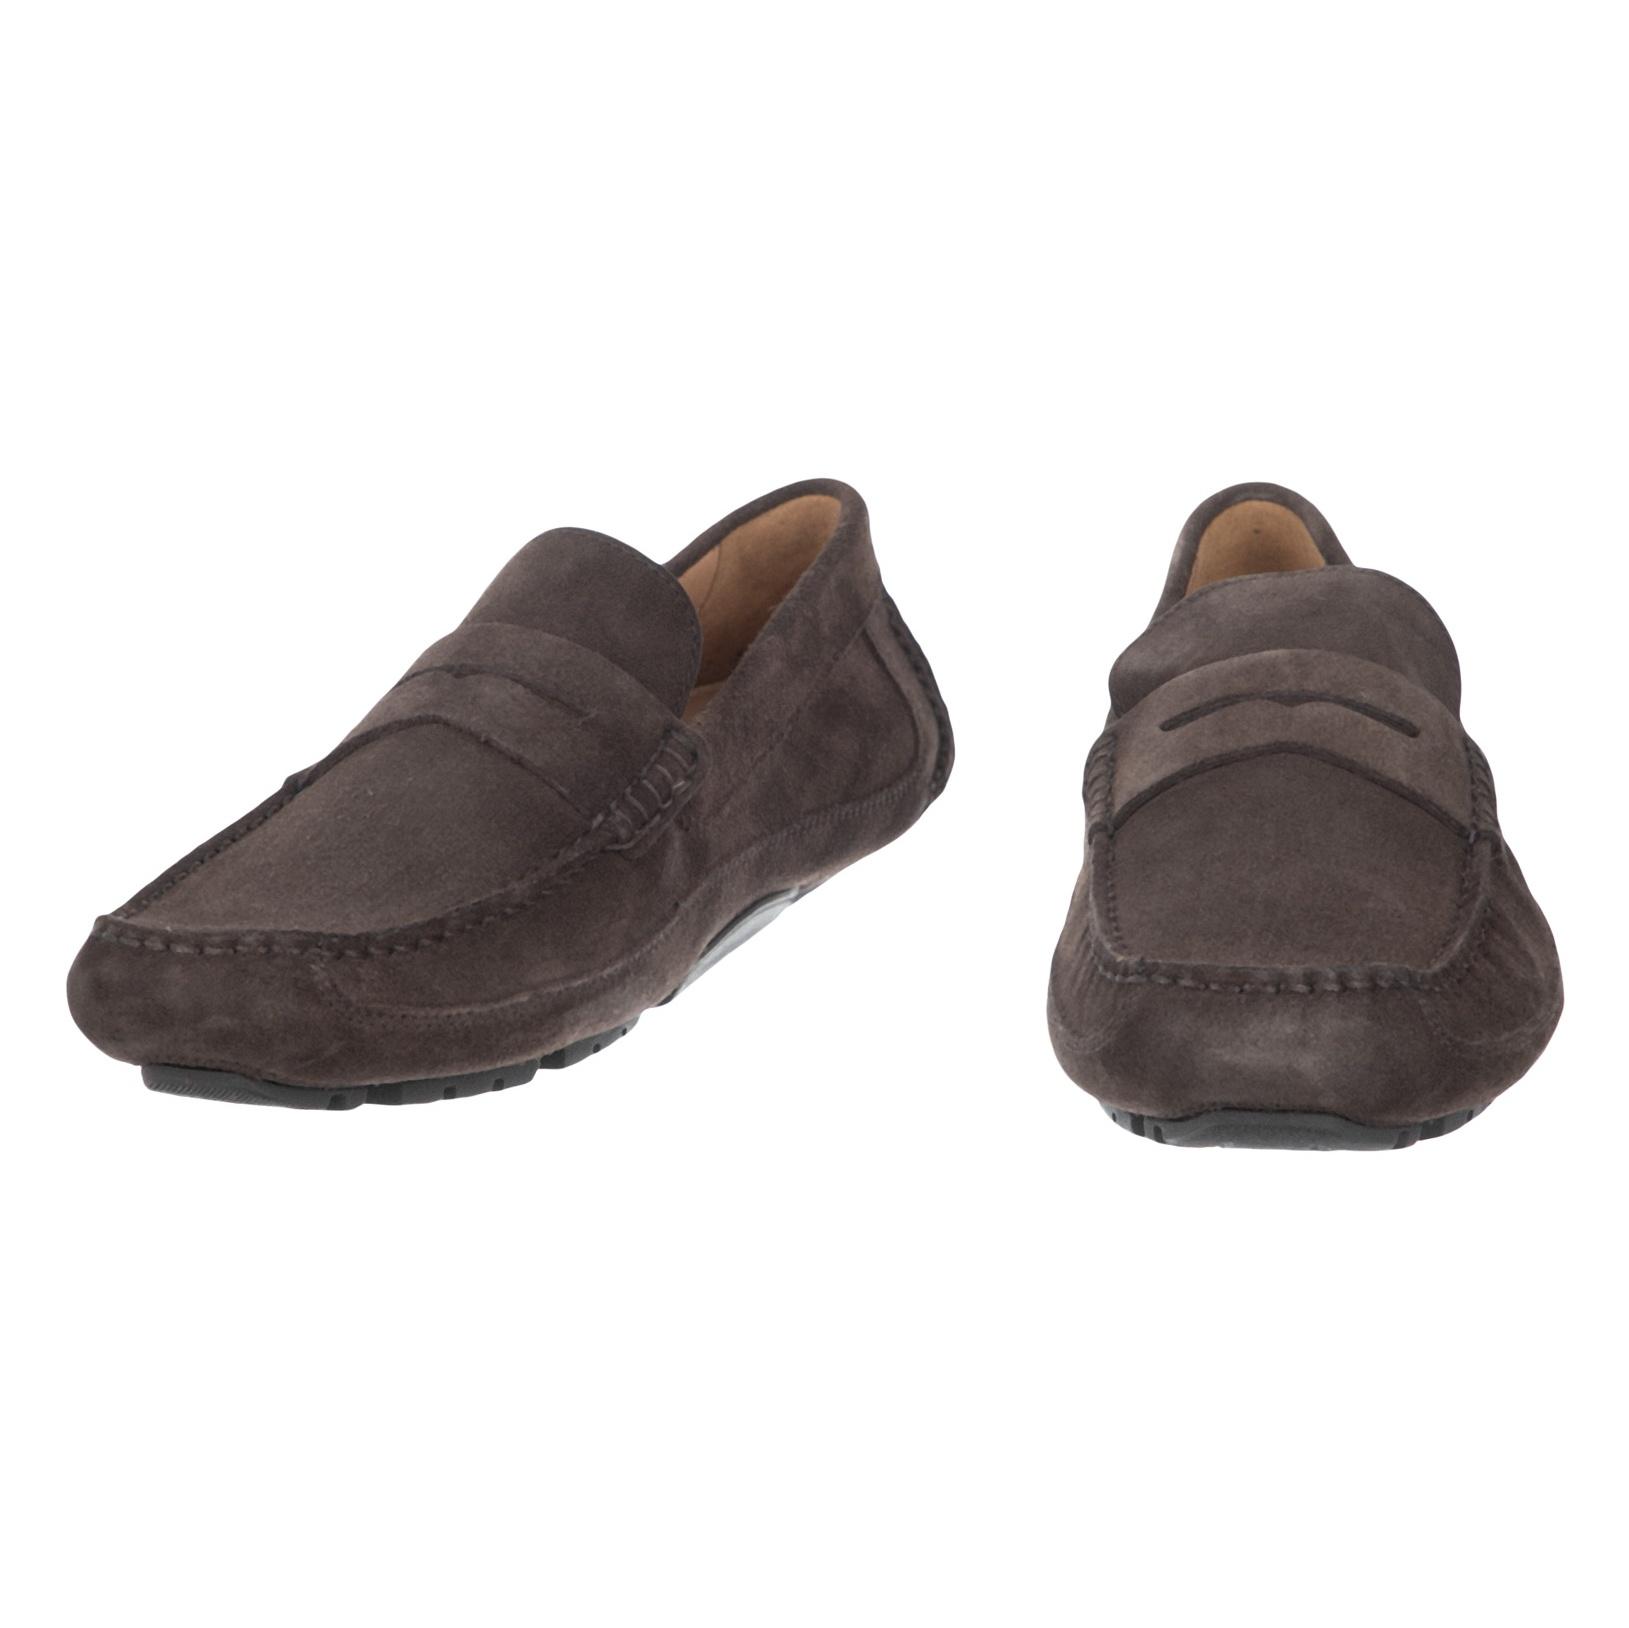 کفش روزمره مردانه جی اوکس مدل U722TA-00022-C6005